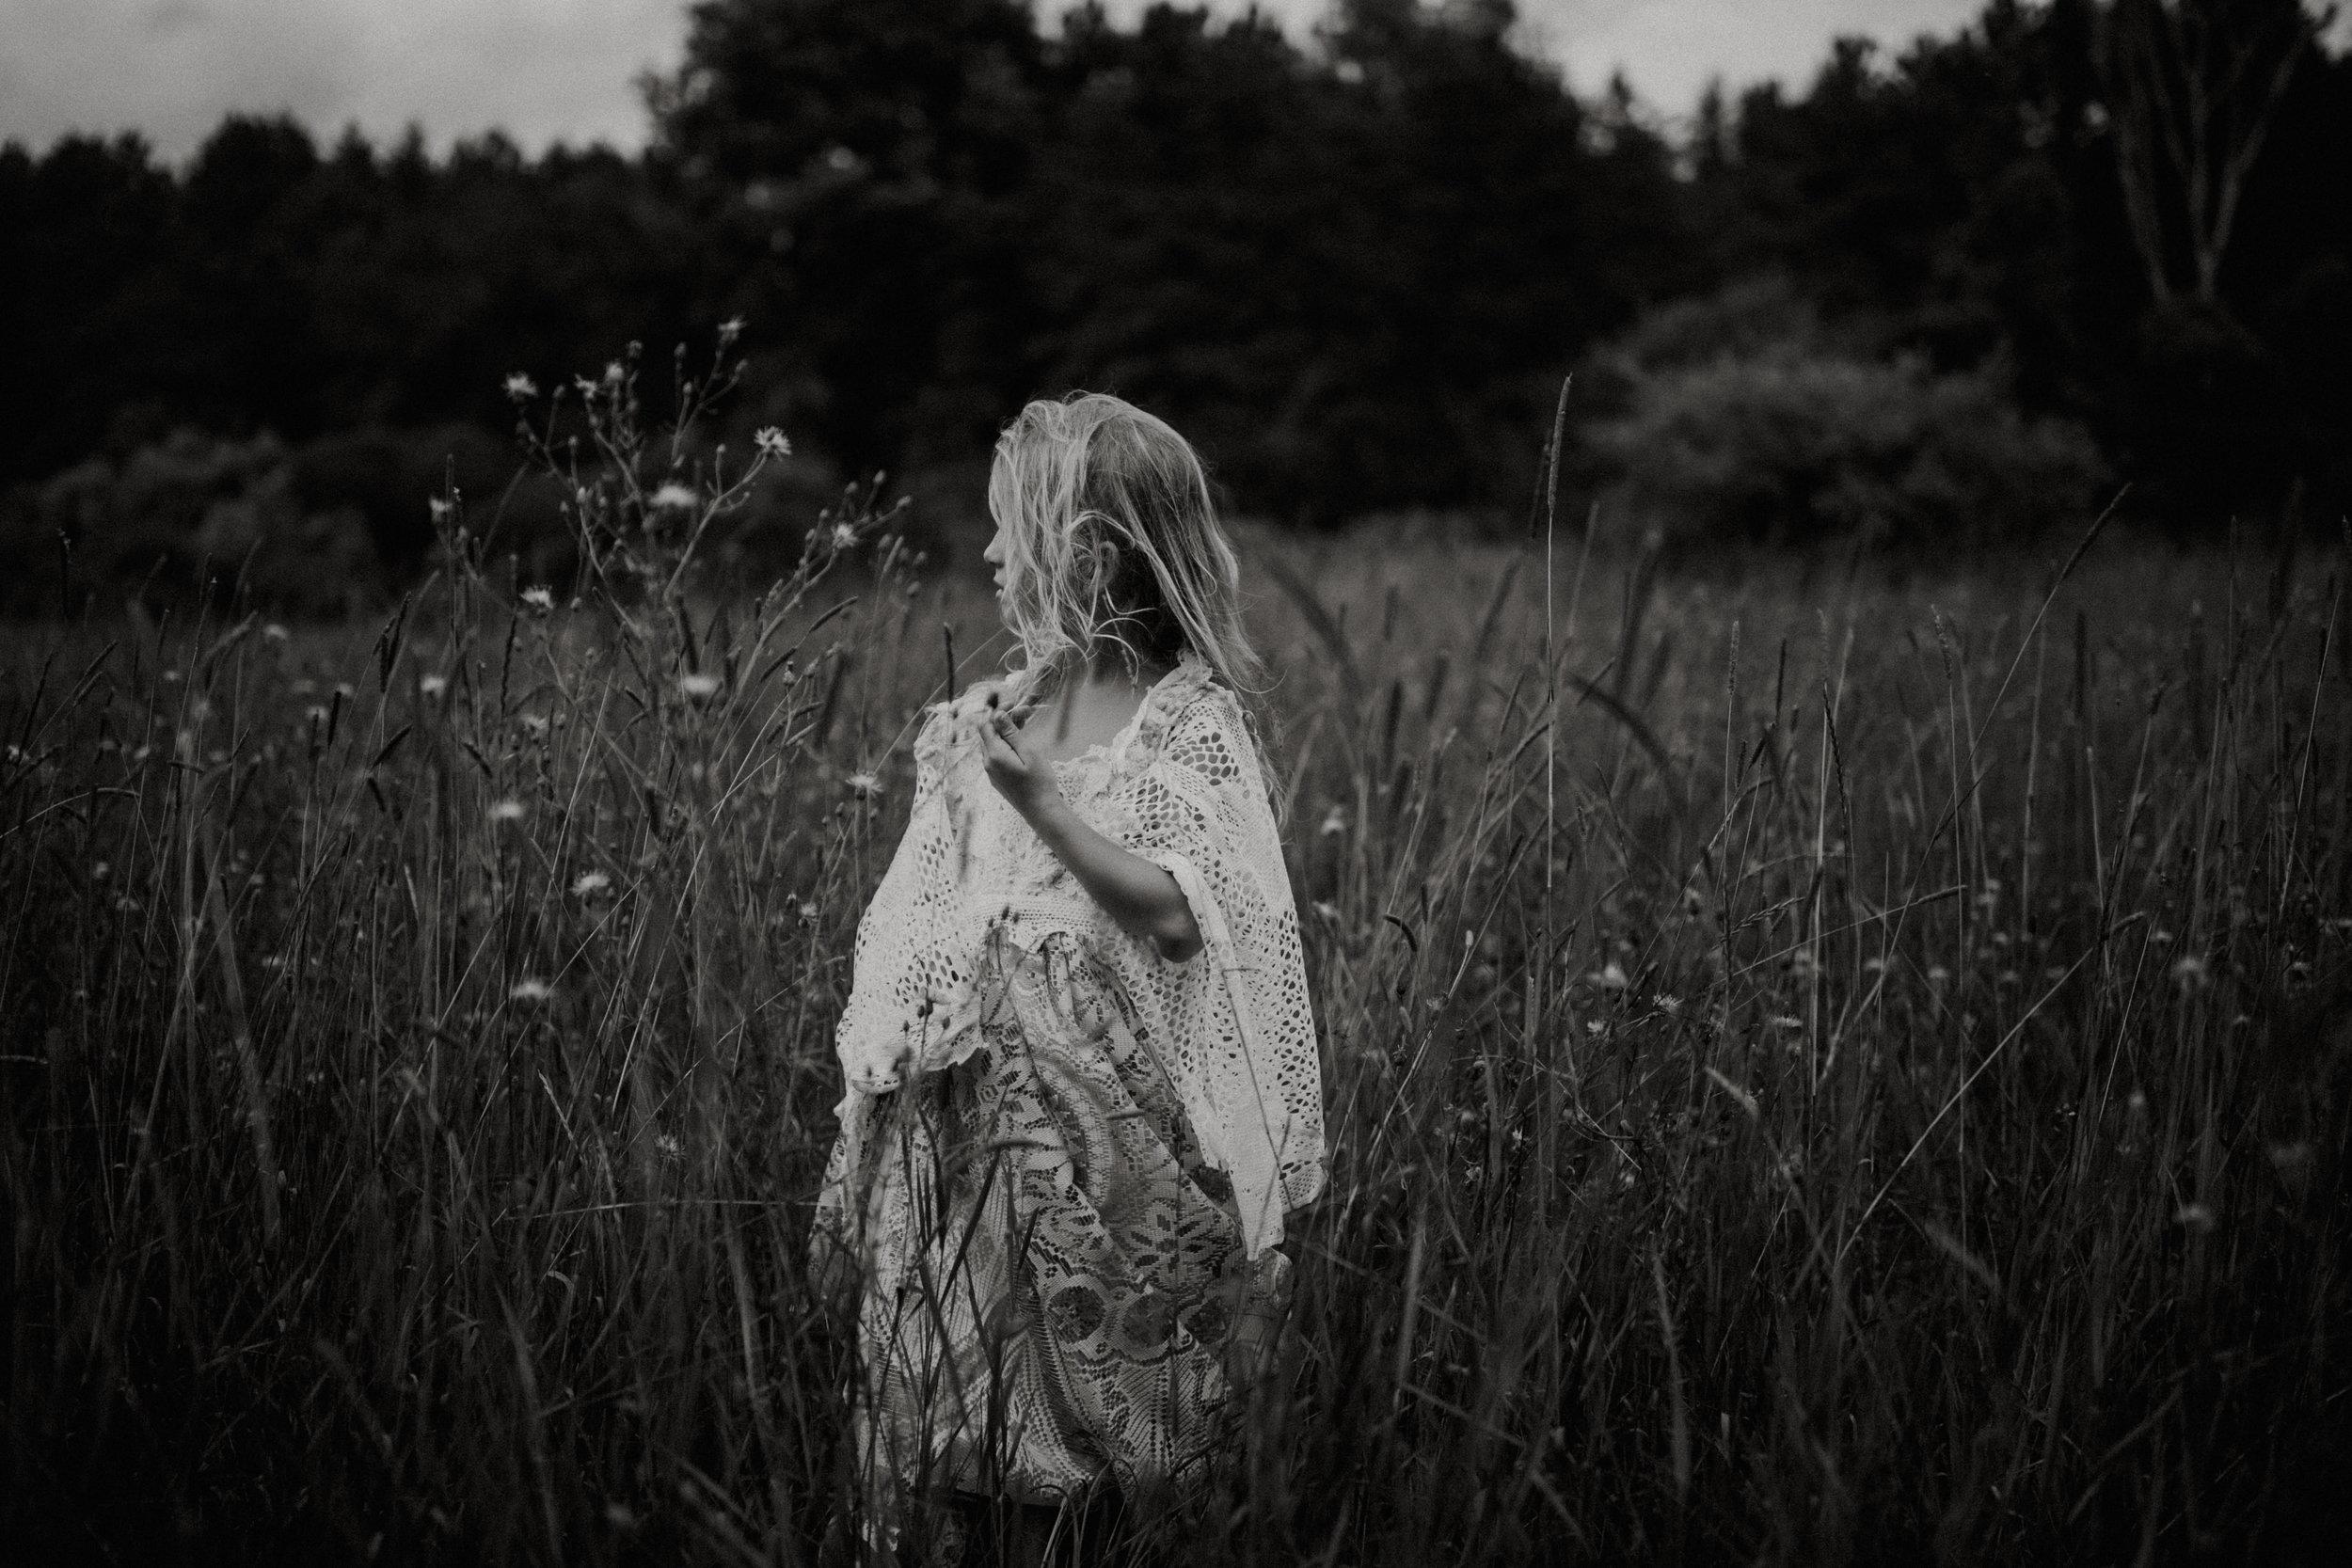 michigan-storytelling-photographer-jessica-max-reclamation-57.jpg